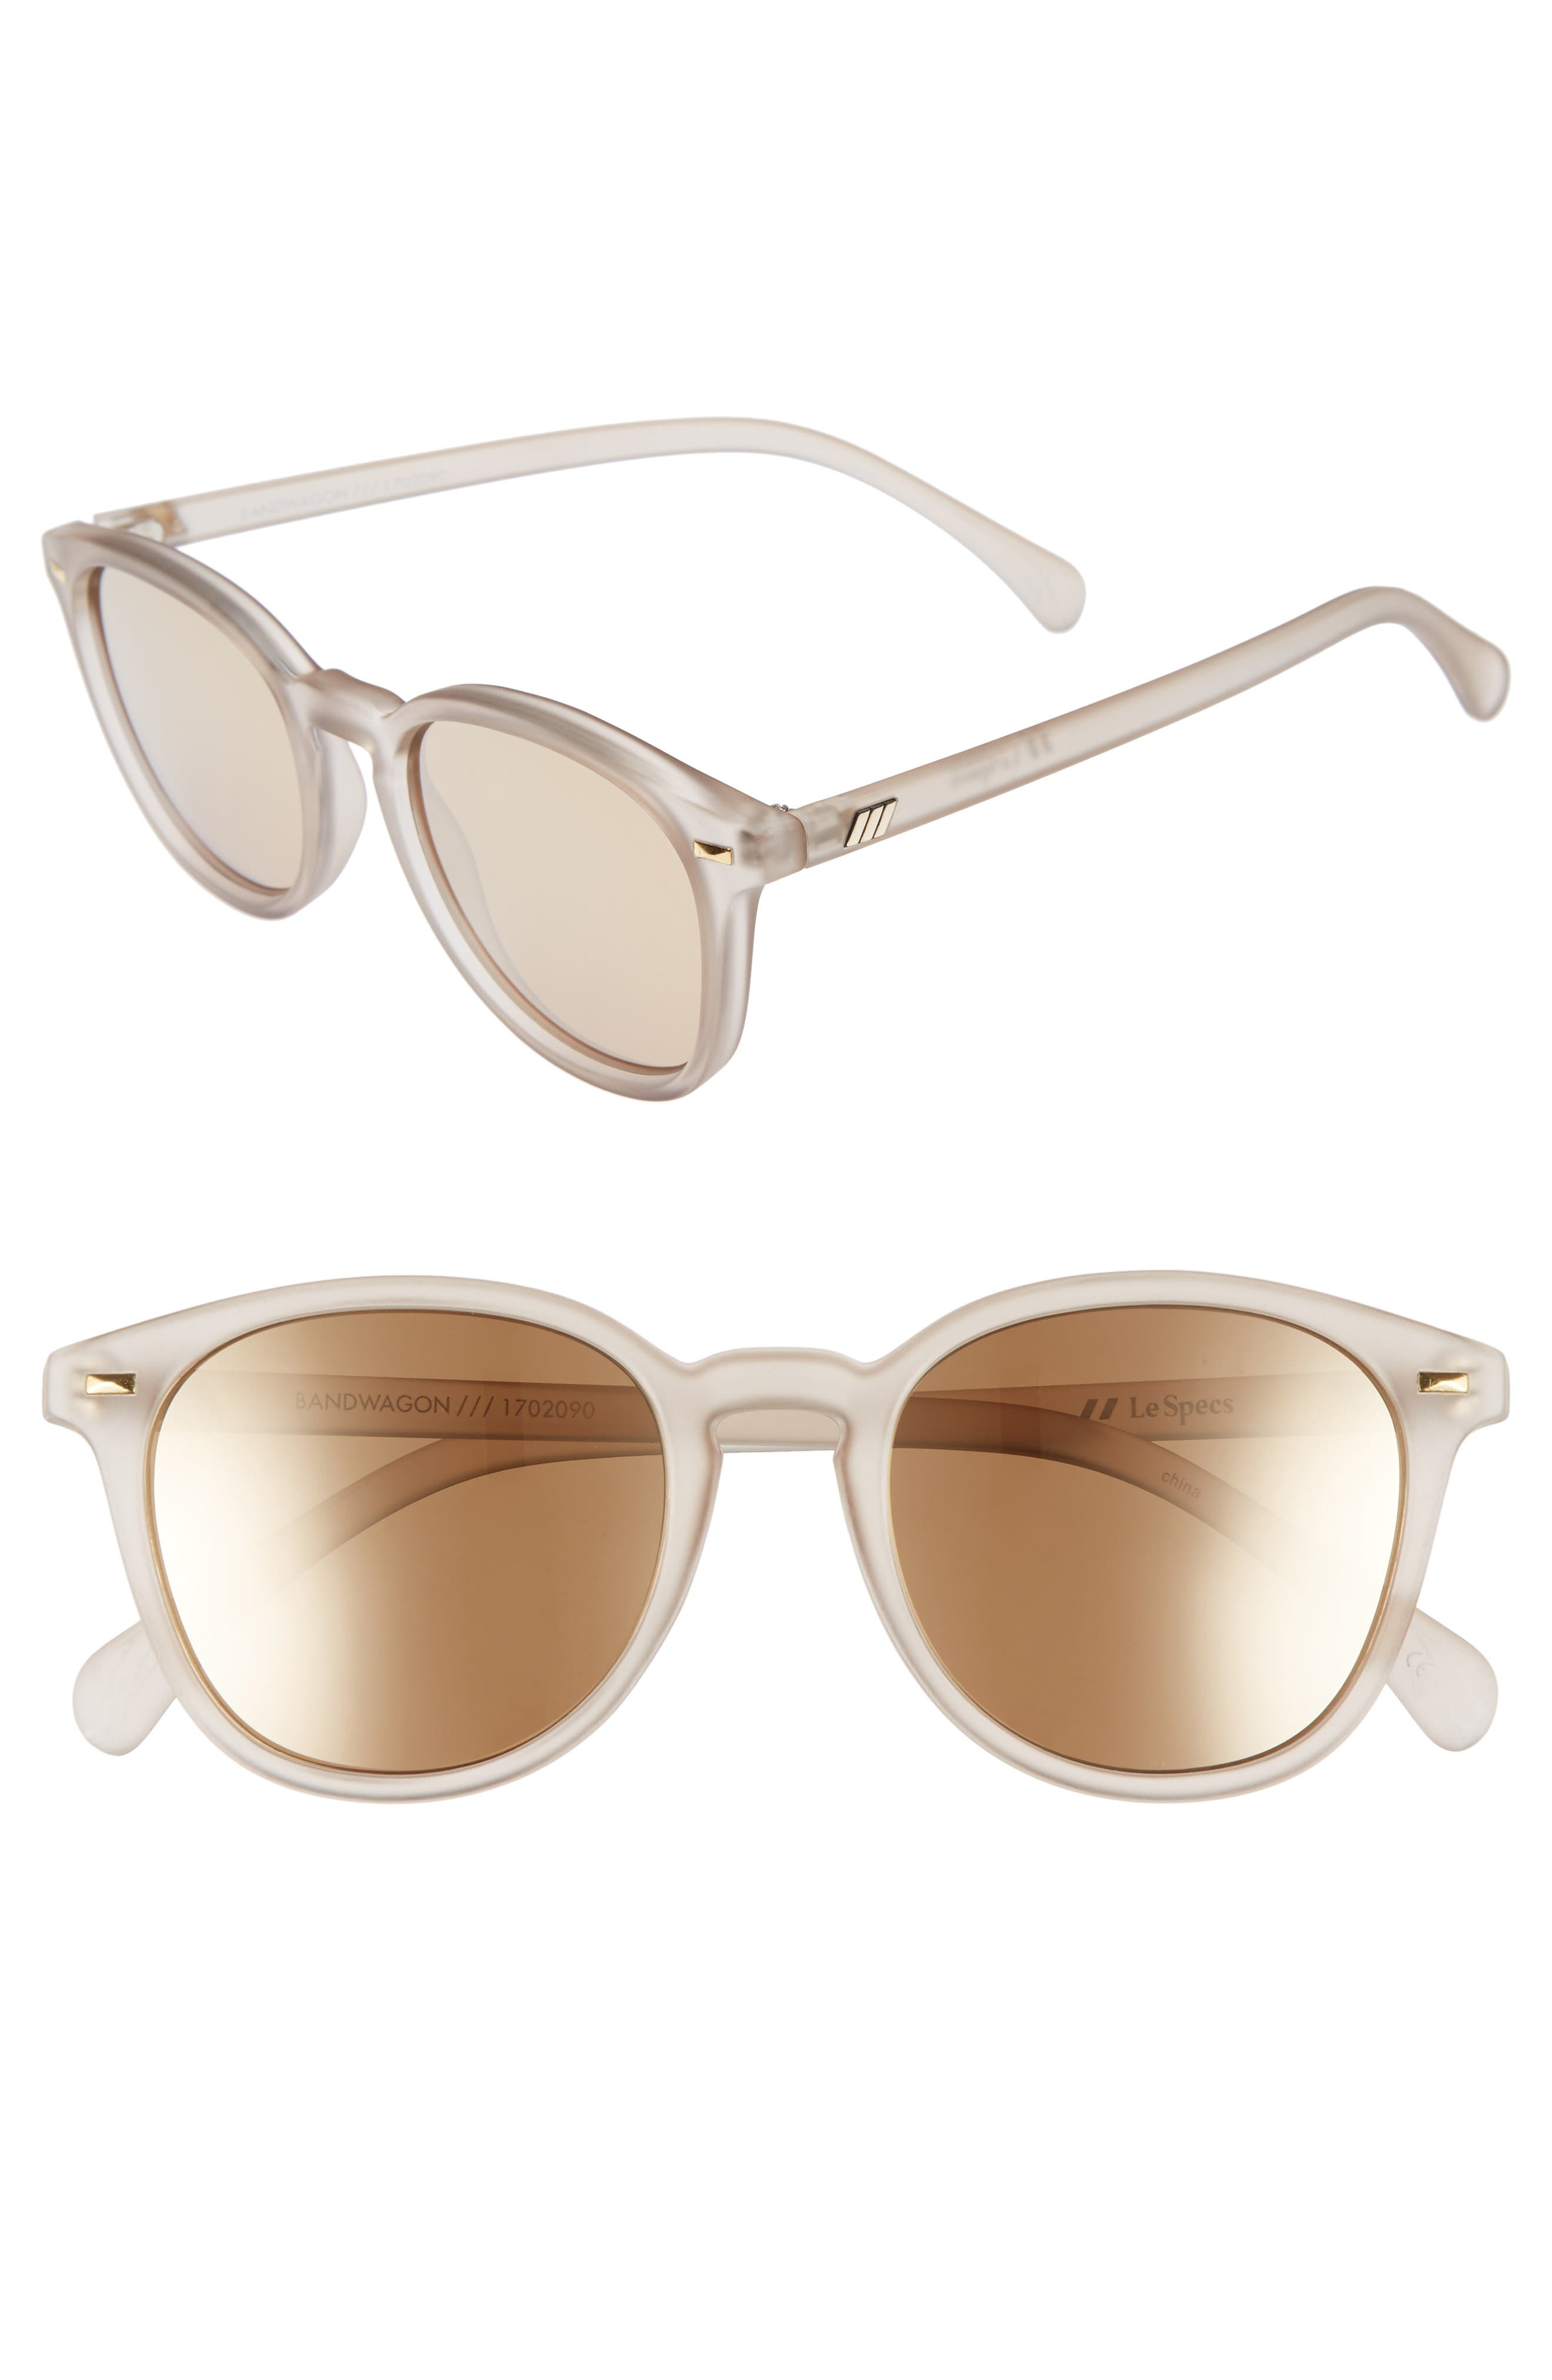 Main Image - Le Specs 'Bandwagon' 51mm Sunglasses